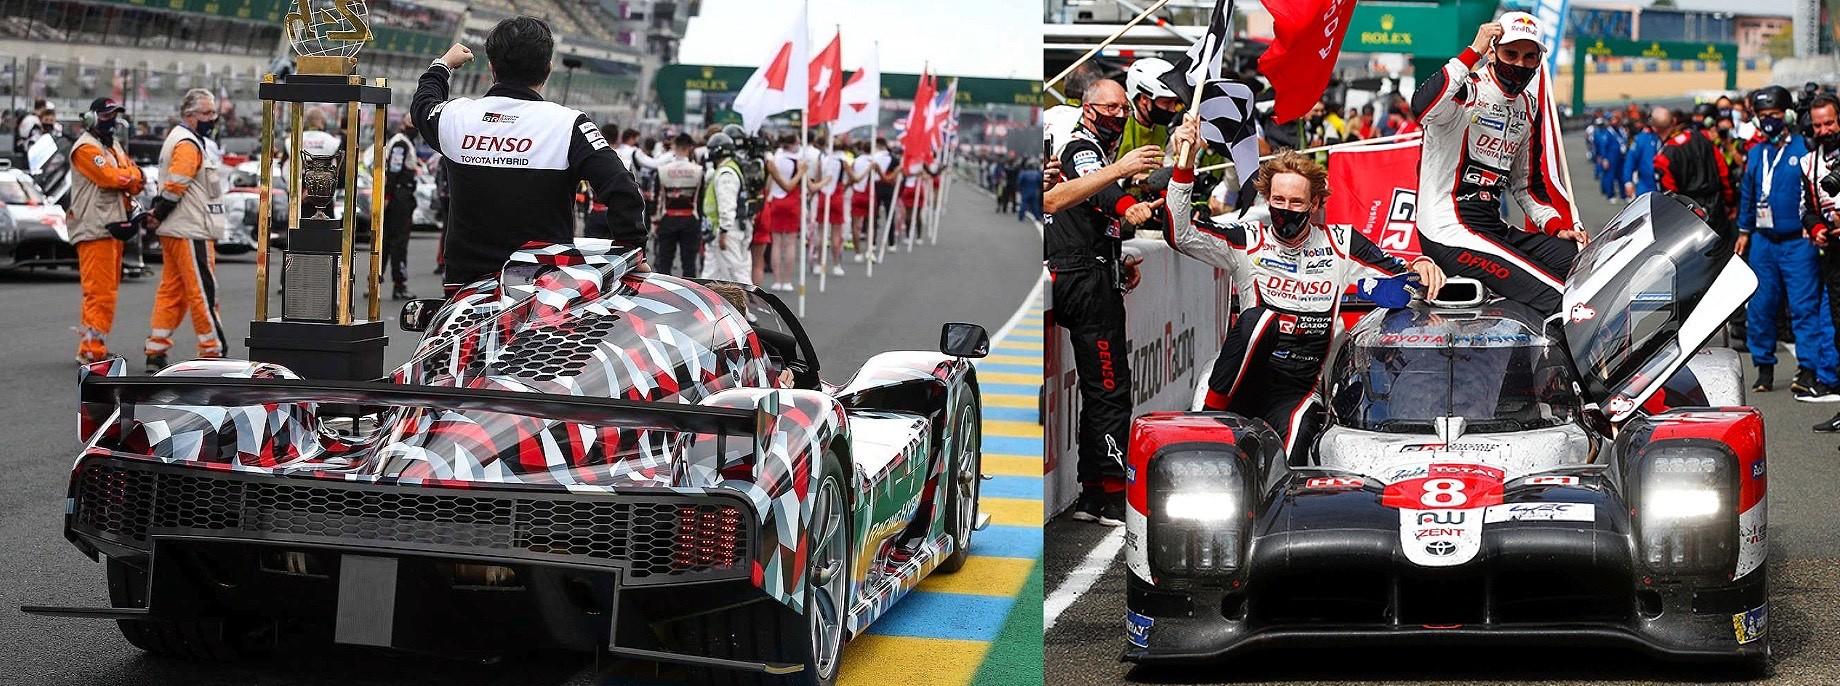 Toyota победила вЛе-Мане ипоказала GR Super Sport